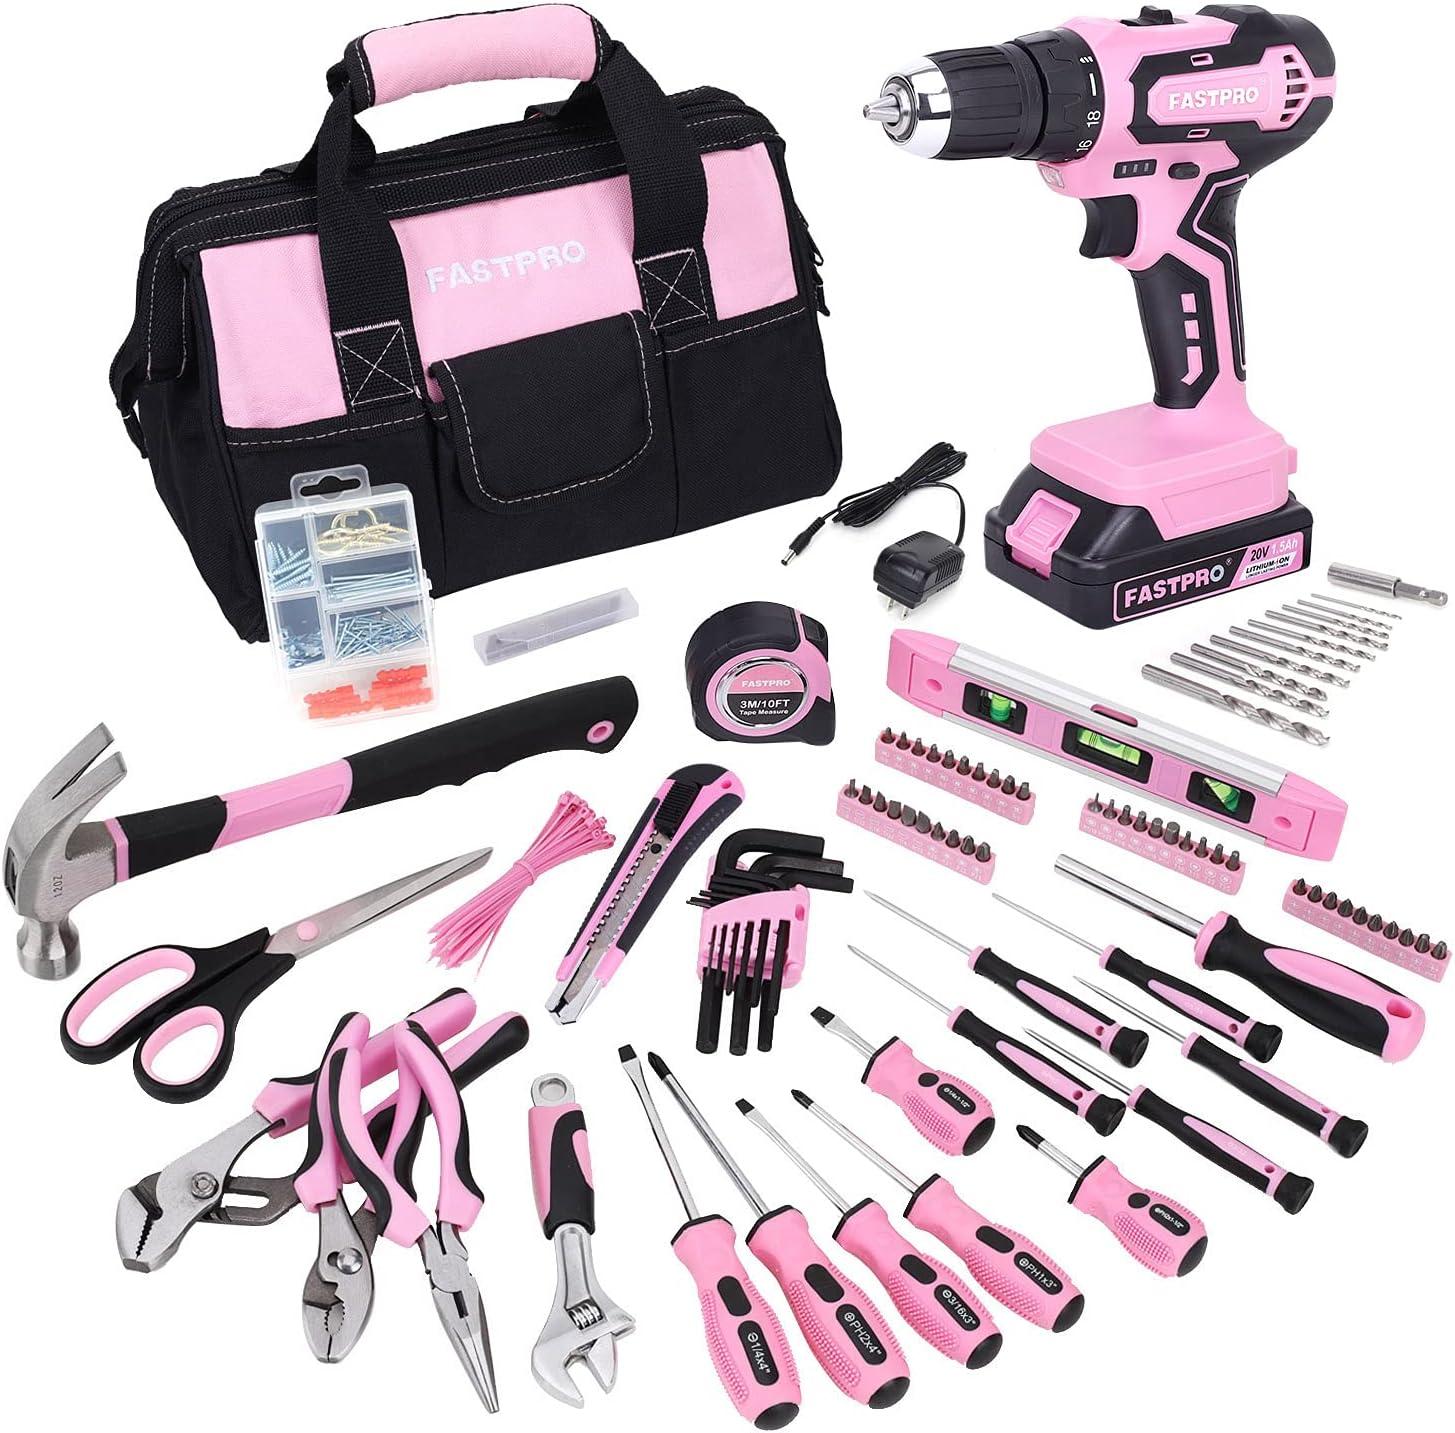 FASTPRO 232-Piece Pink Tool Set